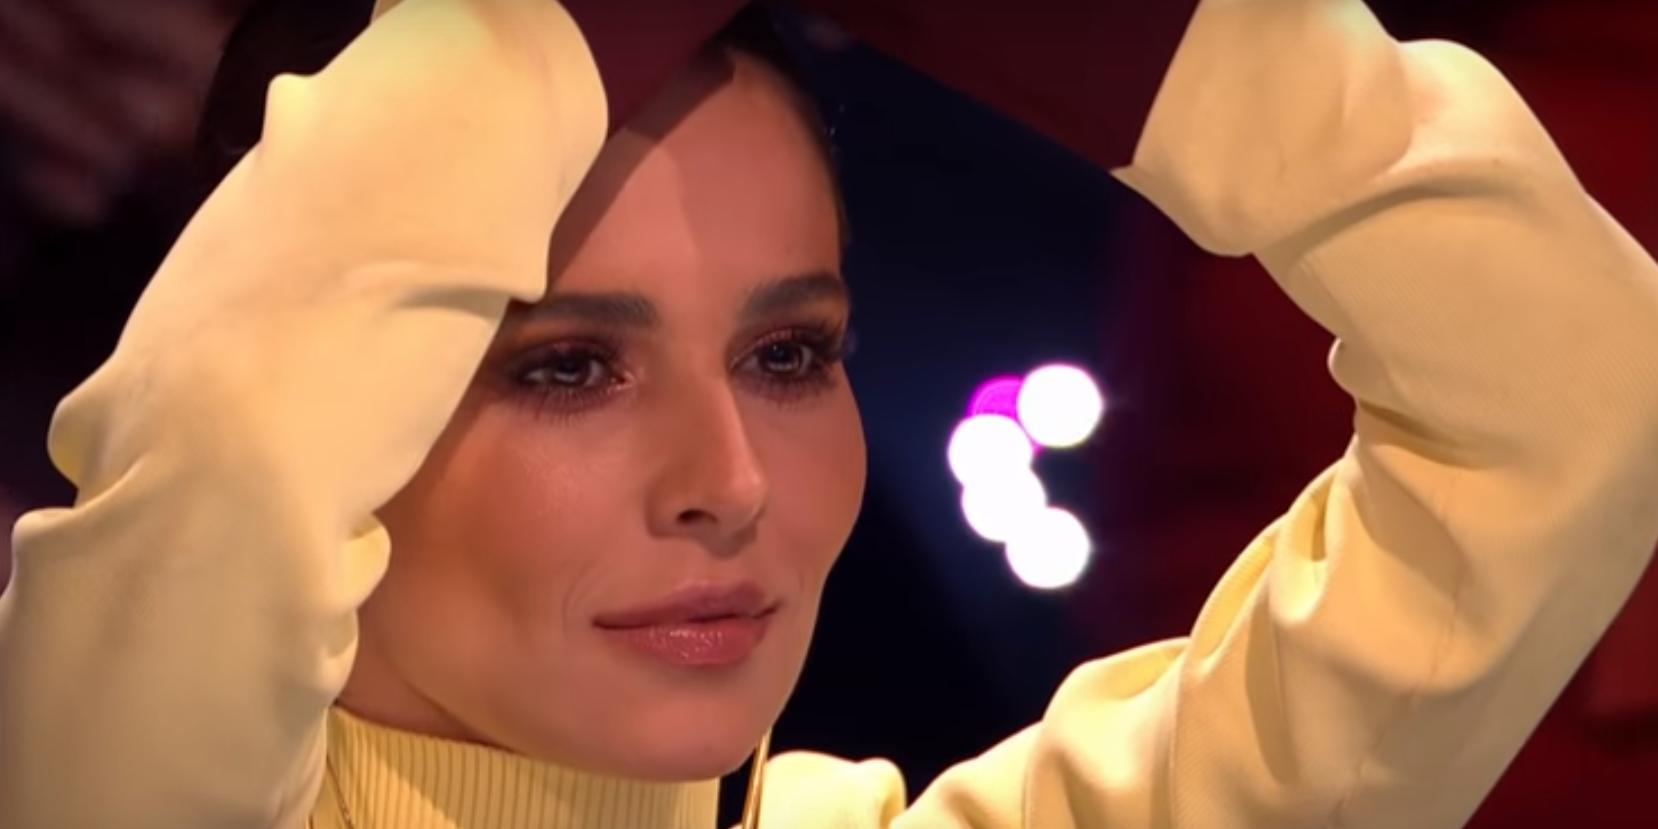 The Greatest Dancer judge Cheryl